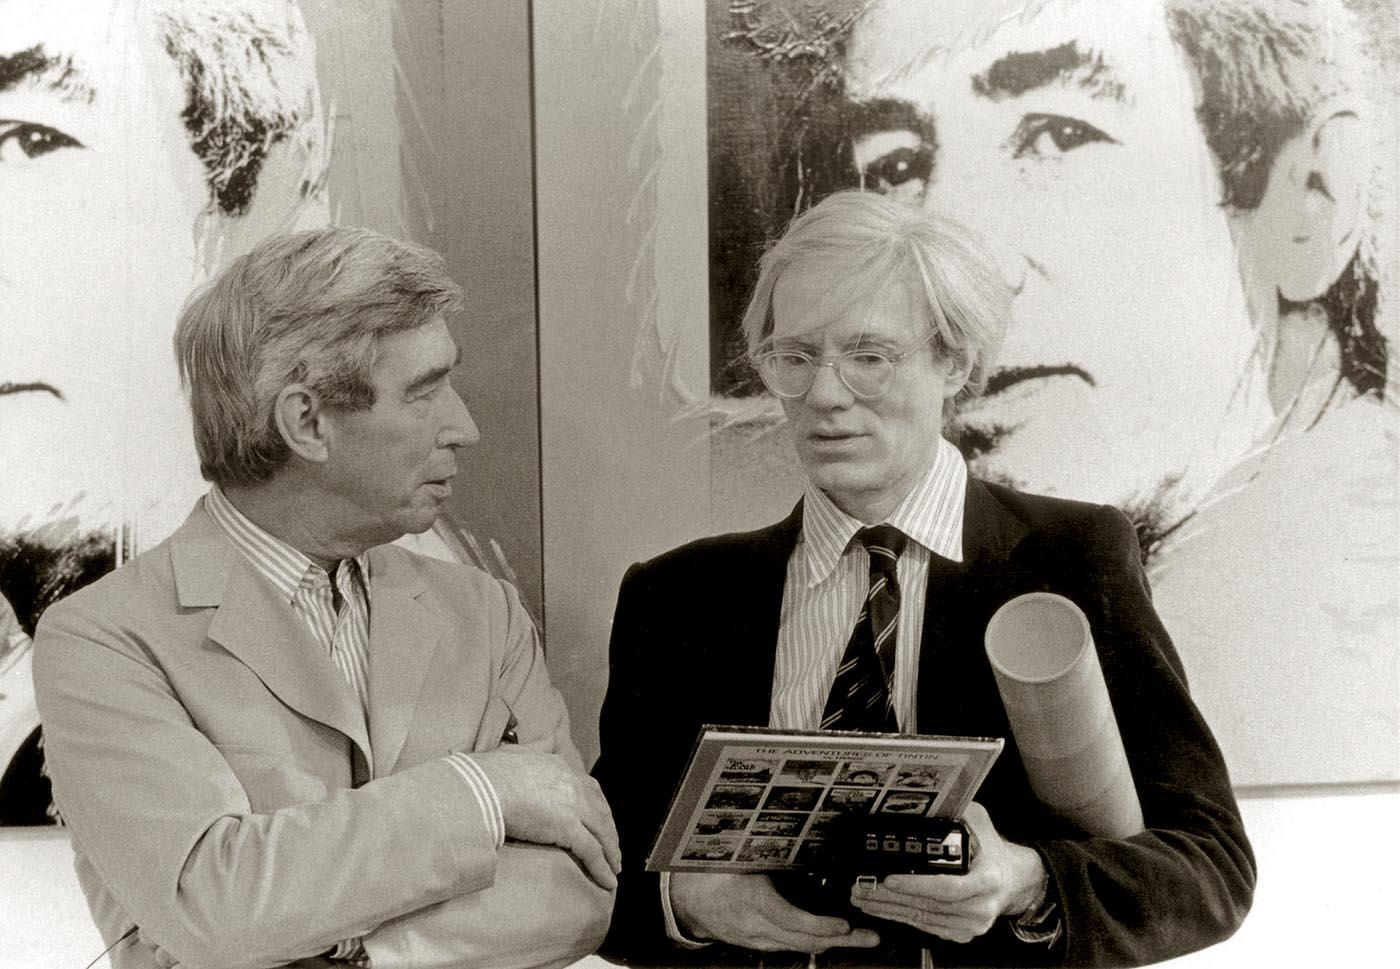 Hergé et Andy Warhol